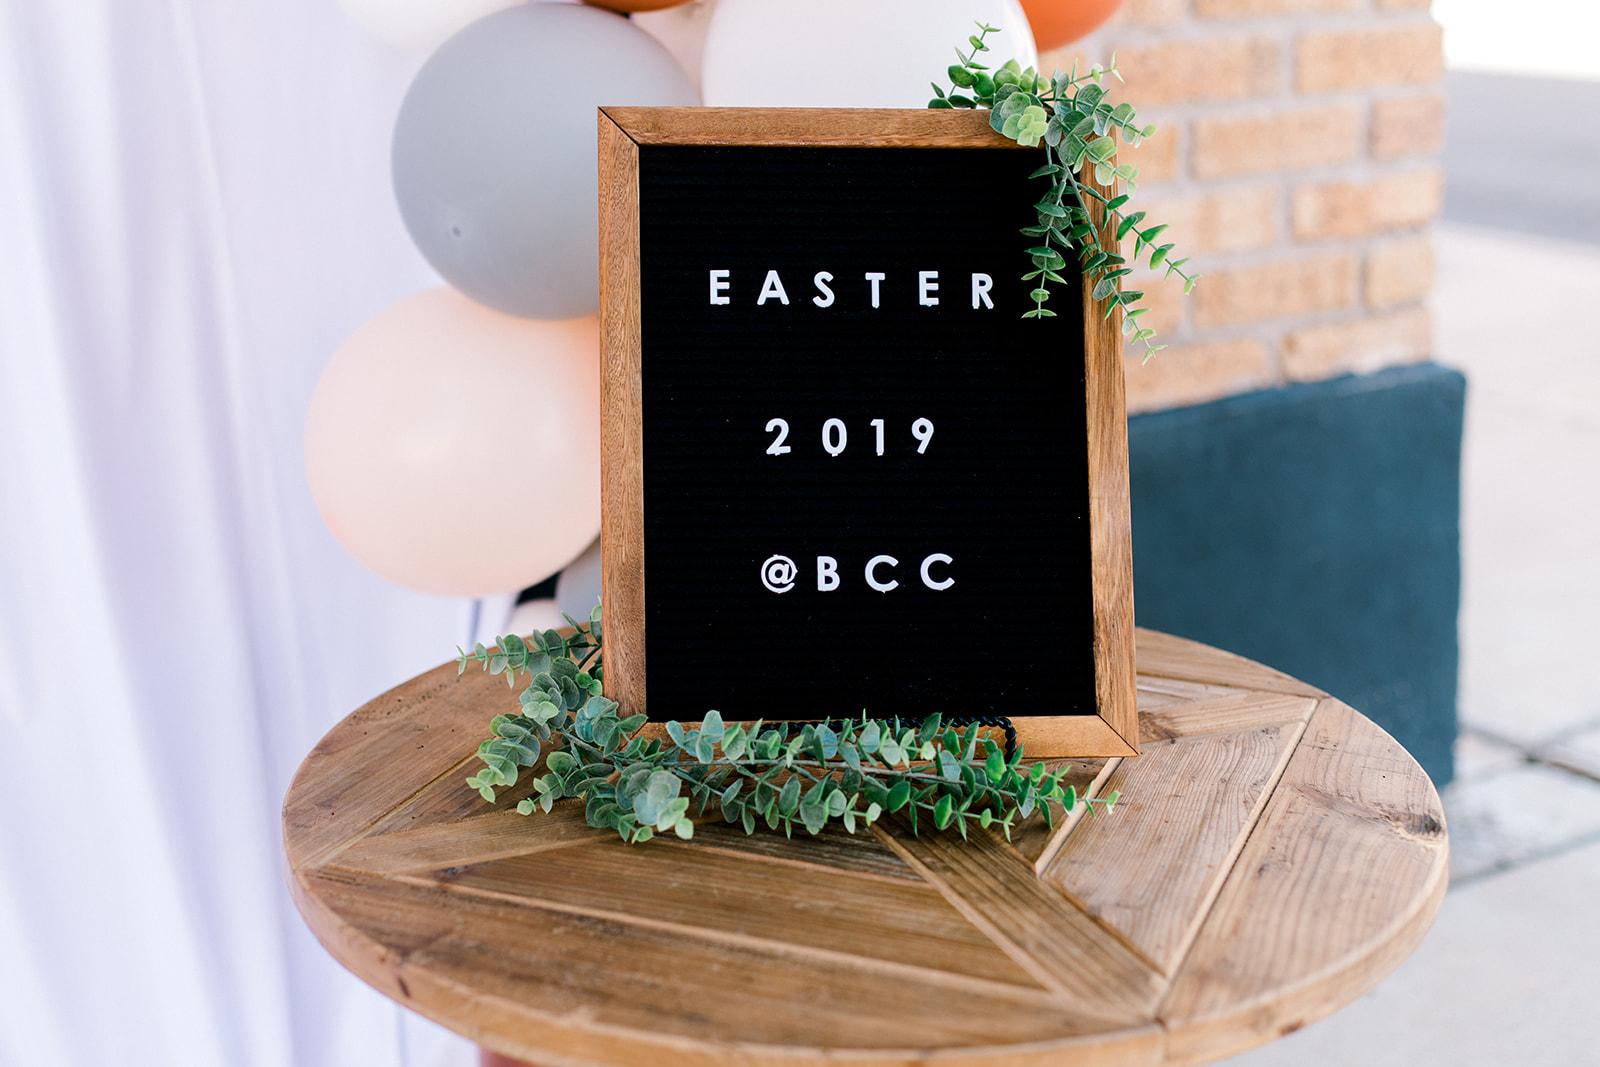 BCC Easter-241A3016.jpg